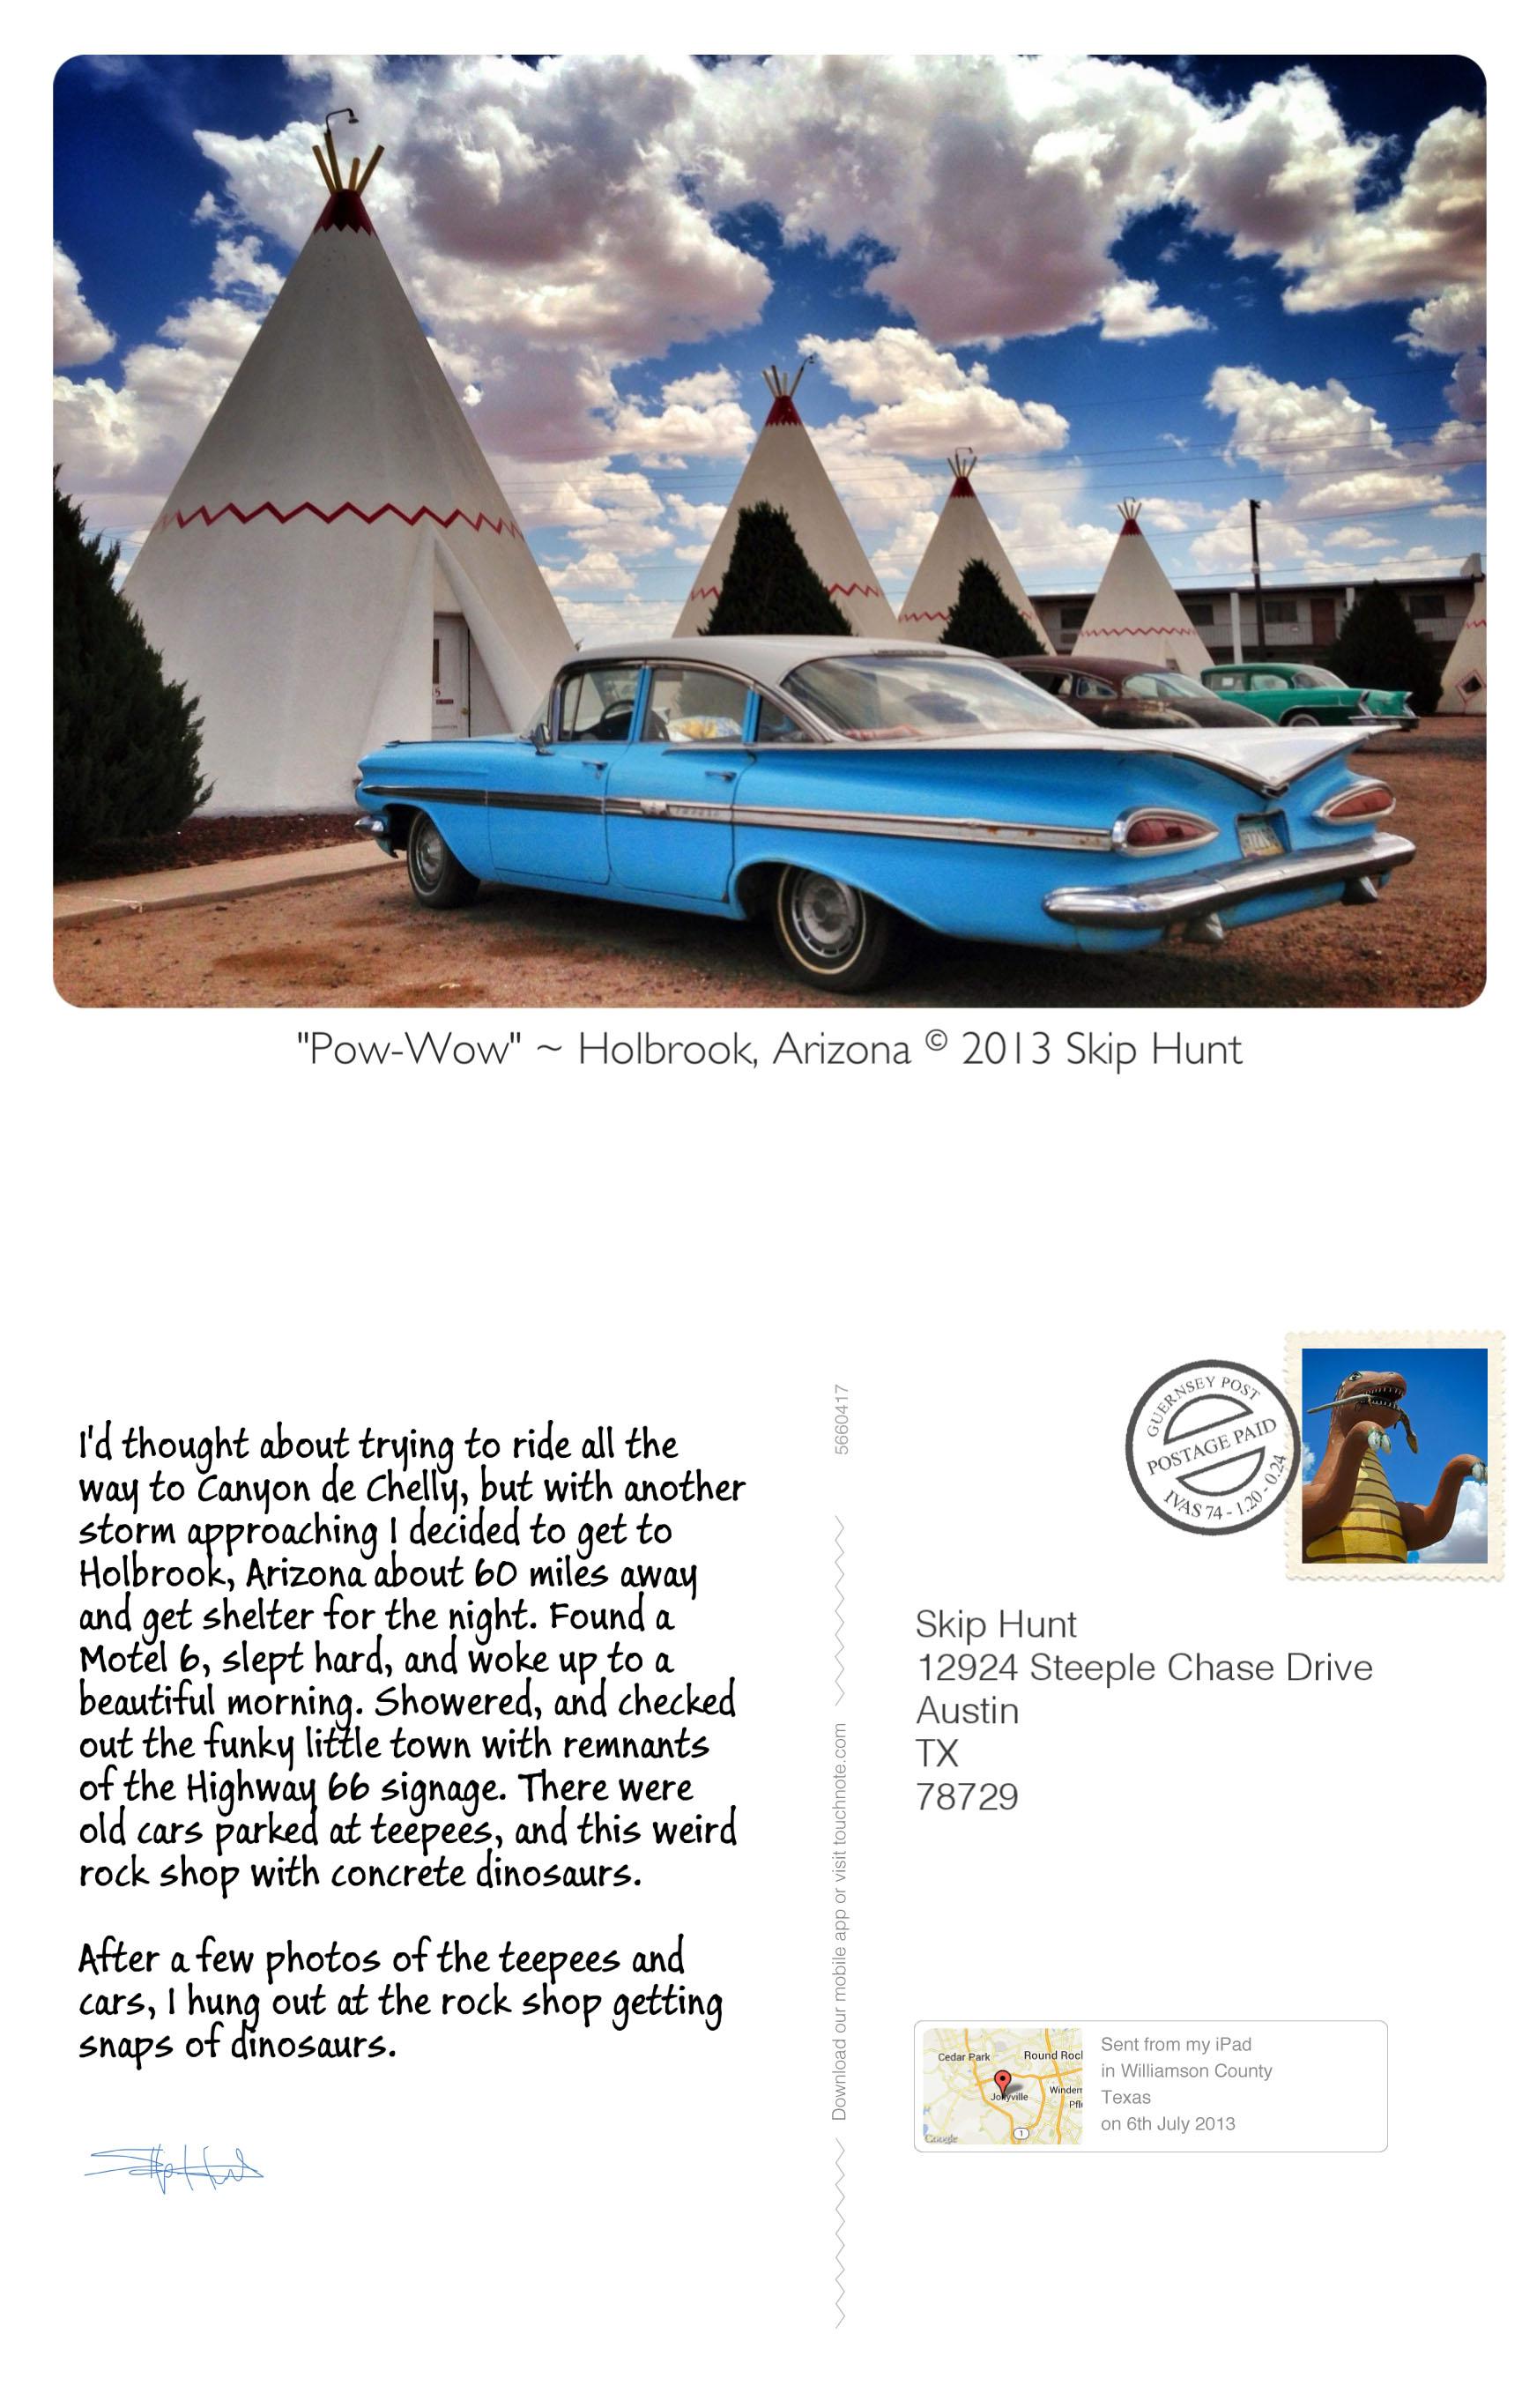 postcardsample.jpg